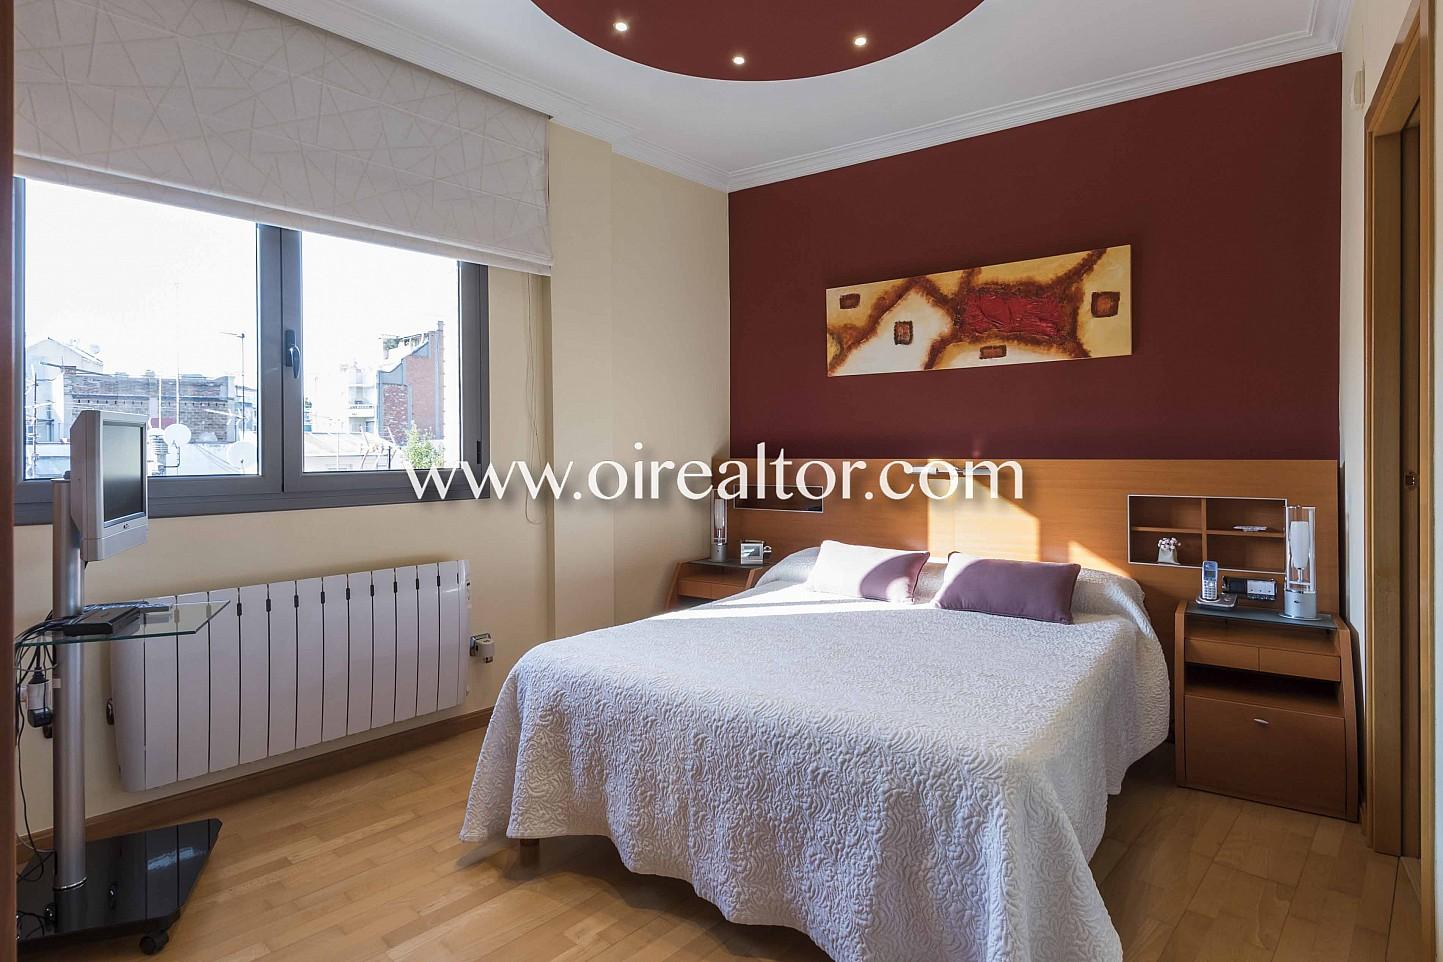 dormitorio, dormitorio doble, dormitorio principal, habitación doble, habitación, cama, cama doble